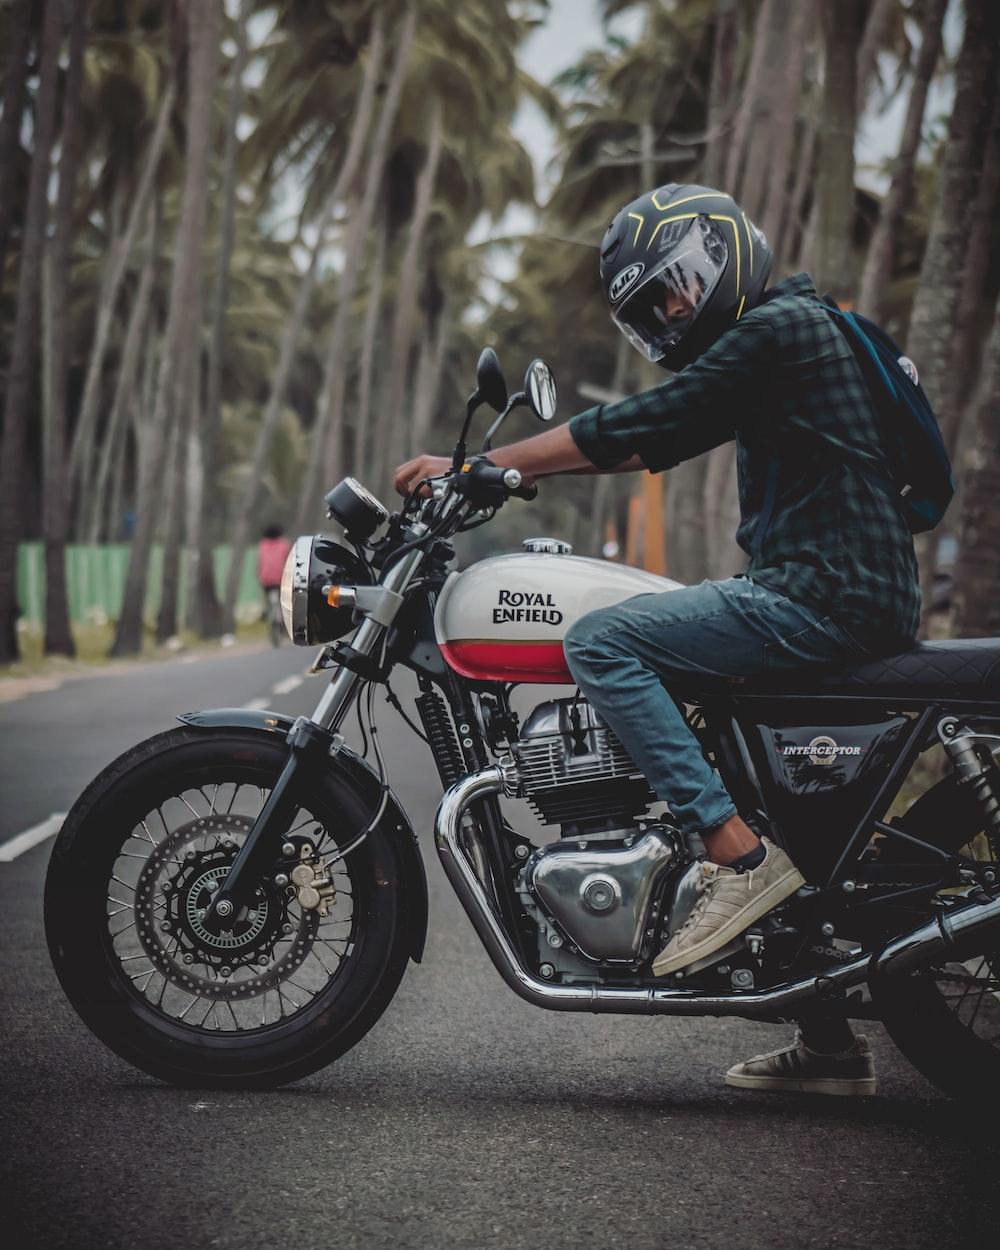 man on Royal Enfield motorcycle